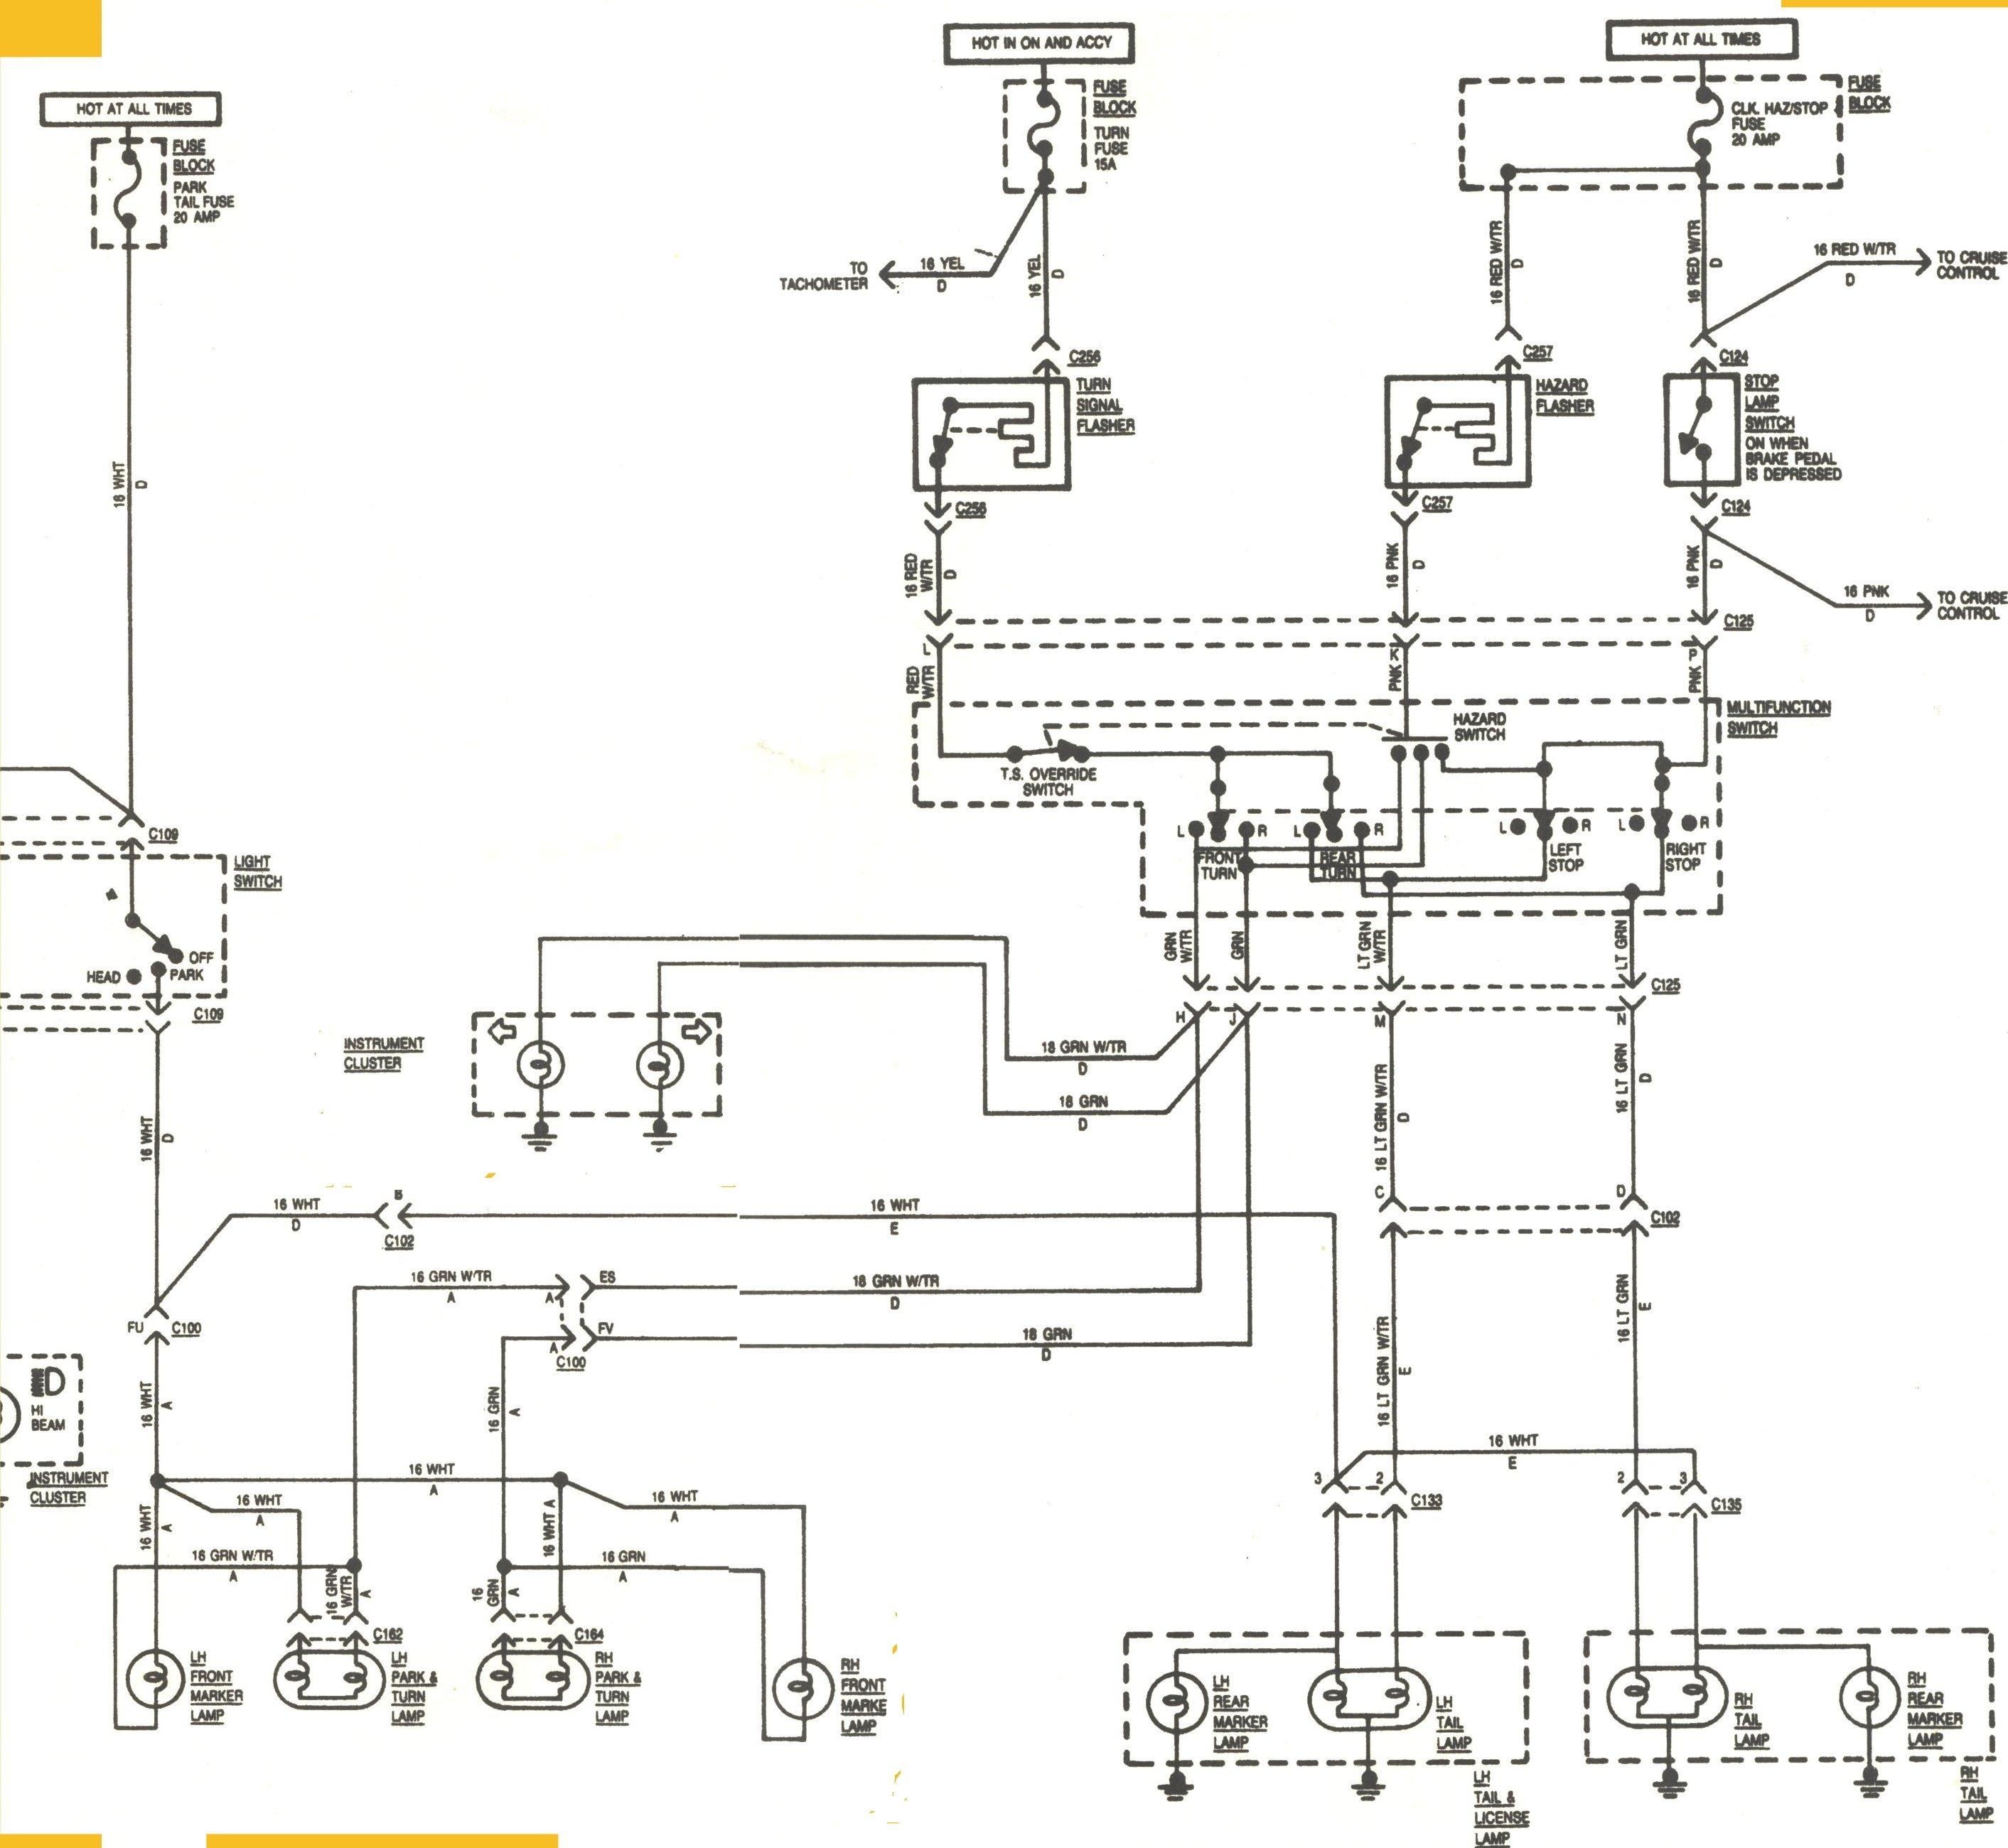 S10 Turn Signal Wiring Diagram - Wiring Diagrams Hubs - Turn Signal Wiring Diagram